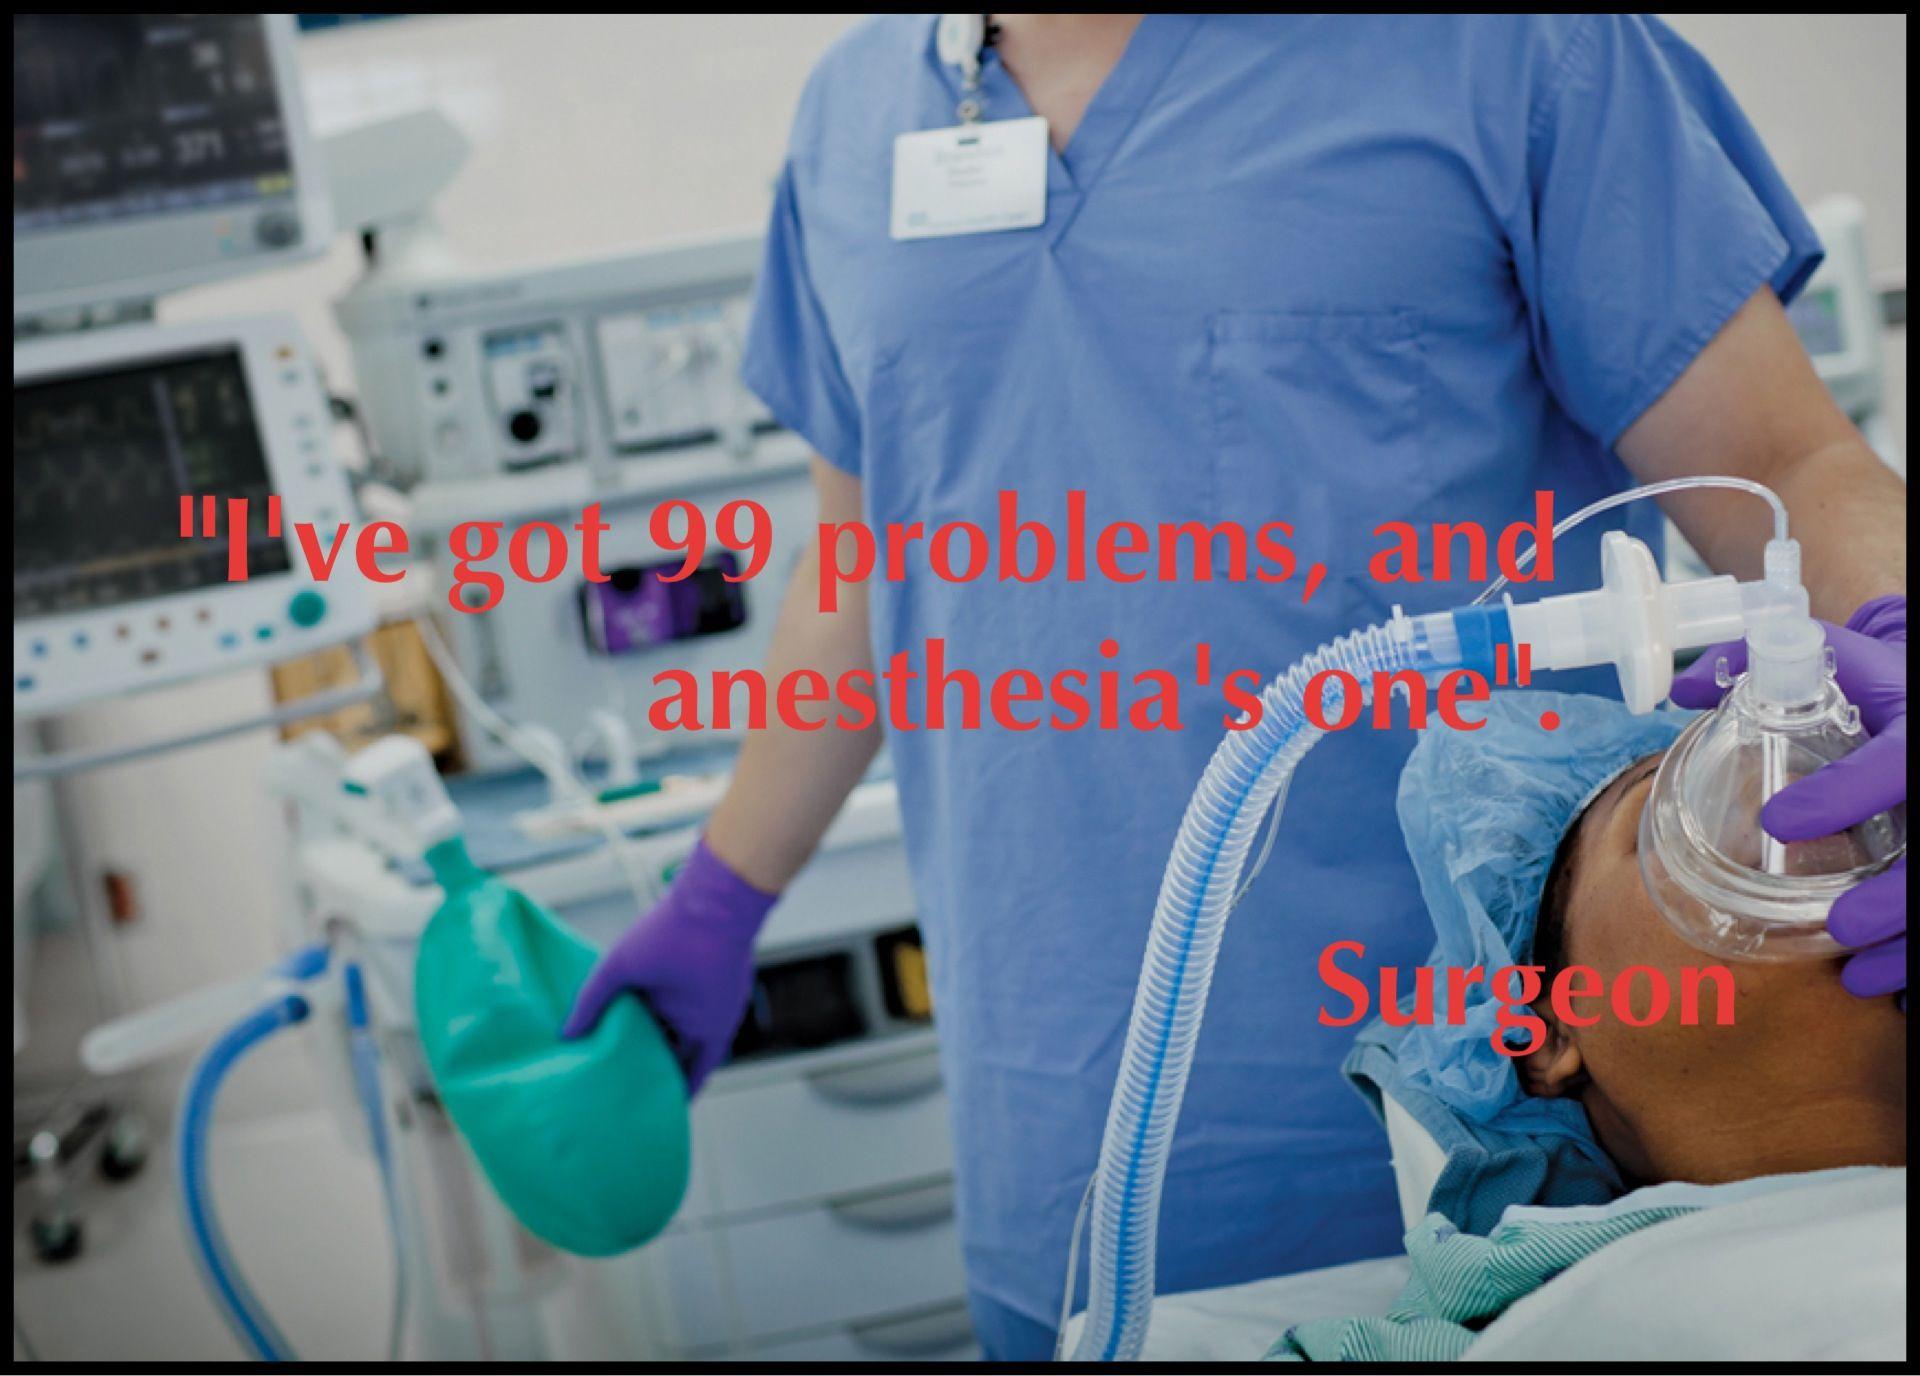 Anesthesia humor. Anesthesia humor, Anesthesia, Best